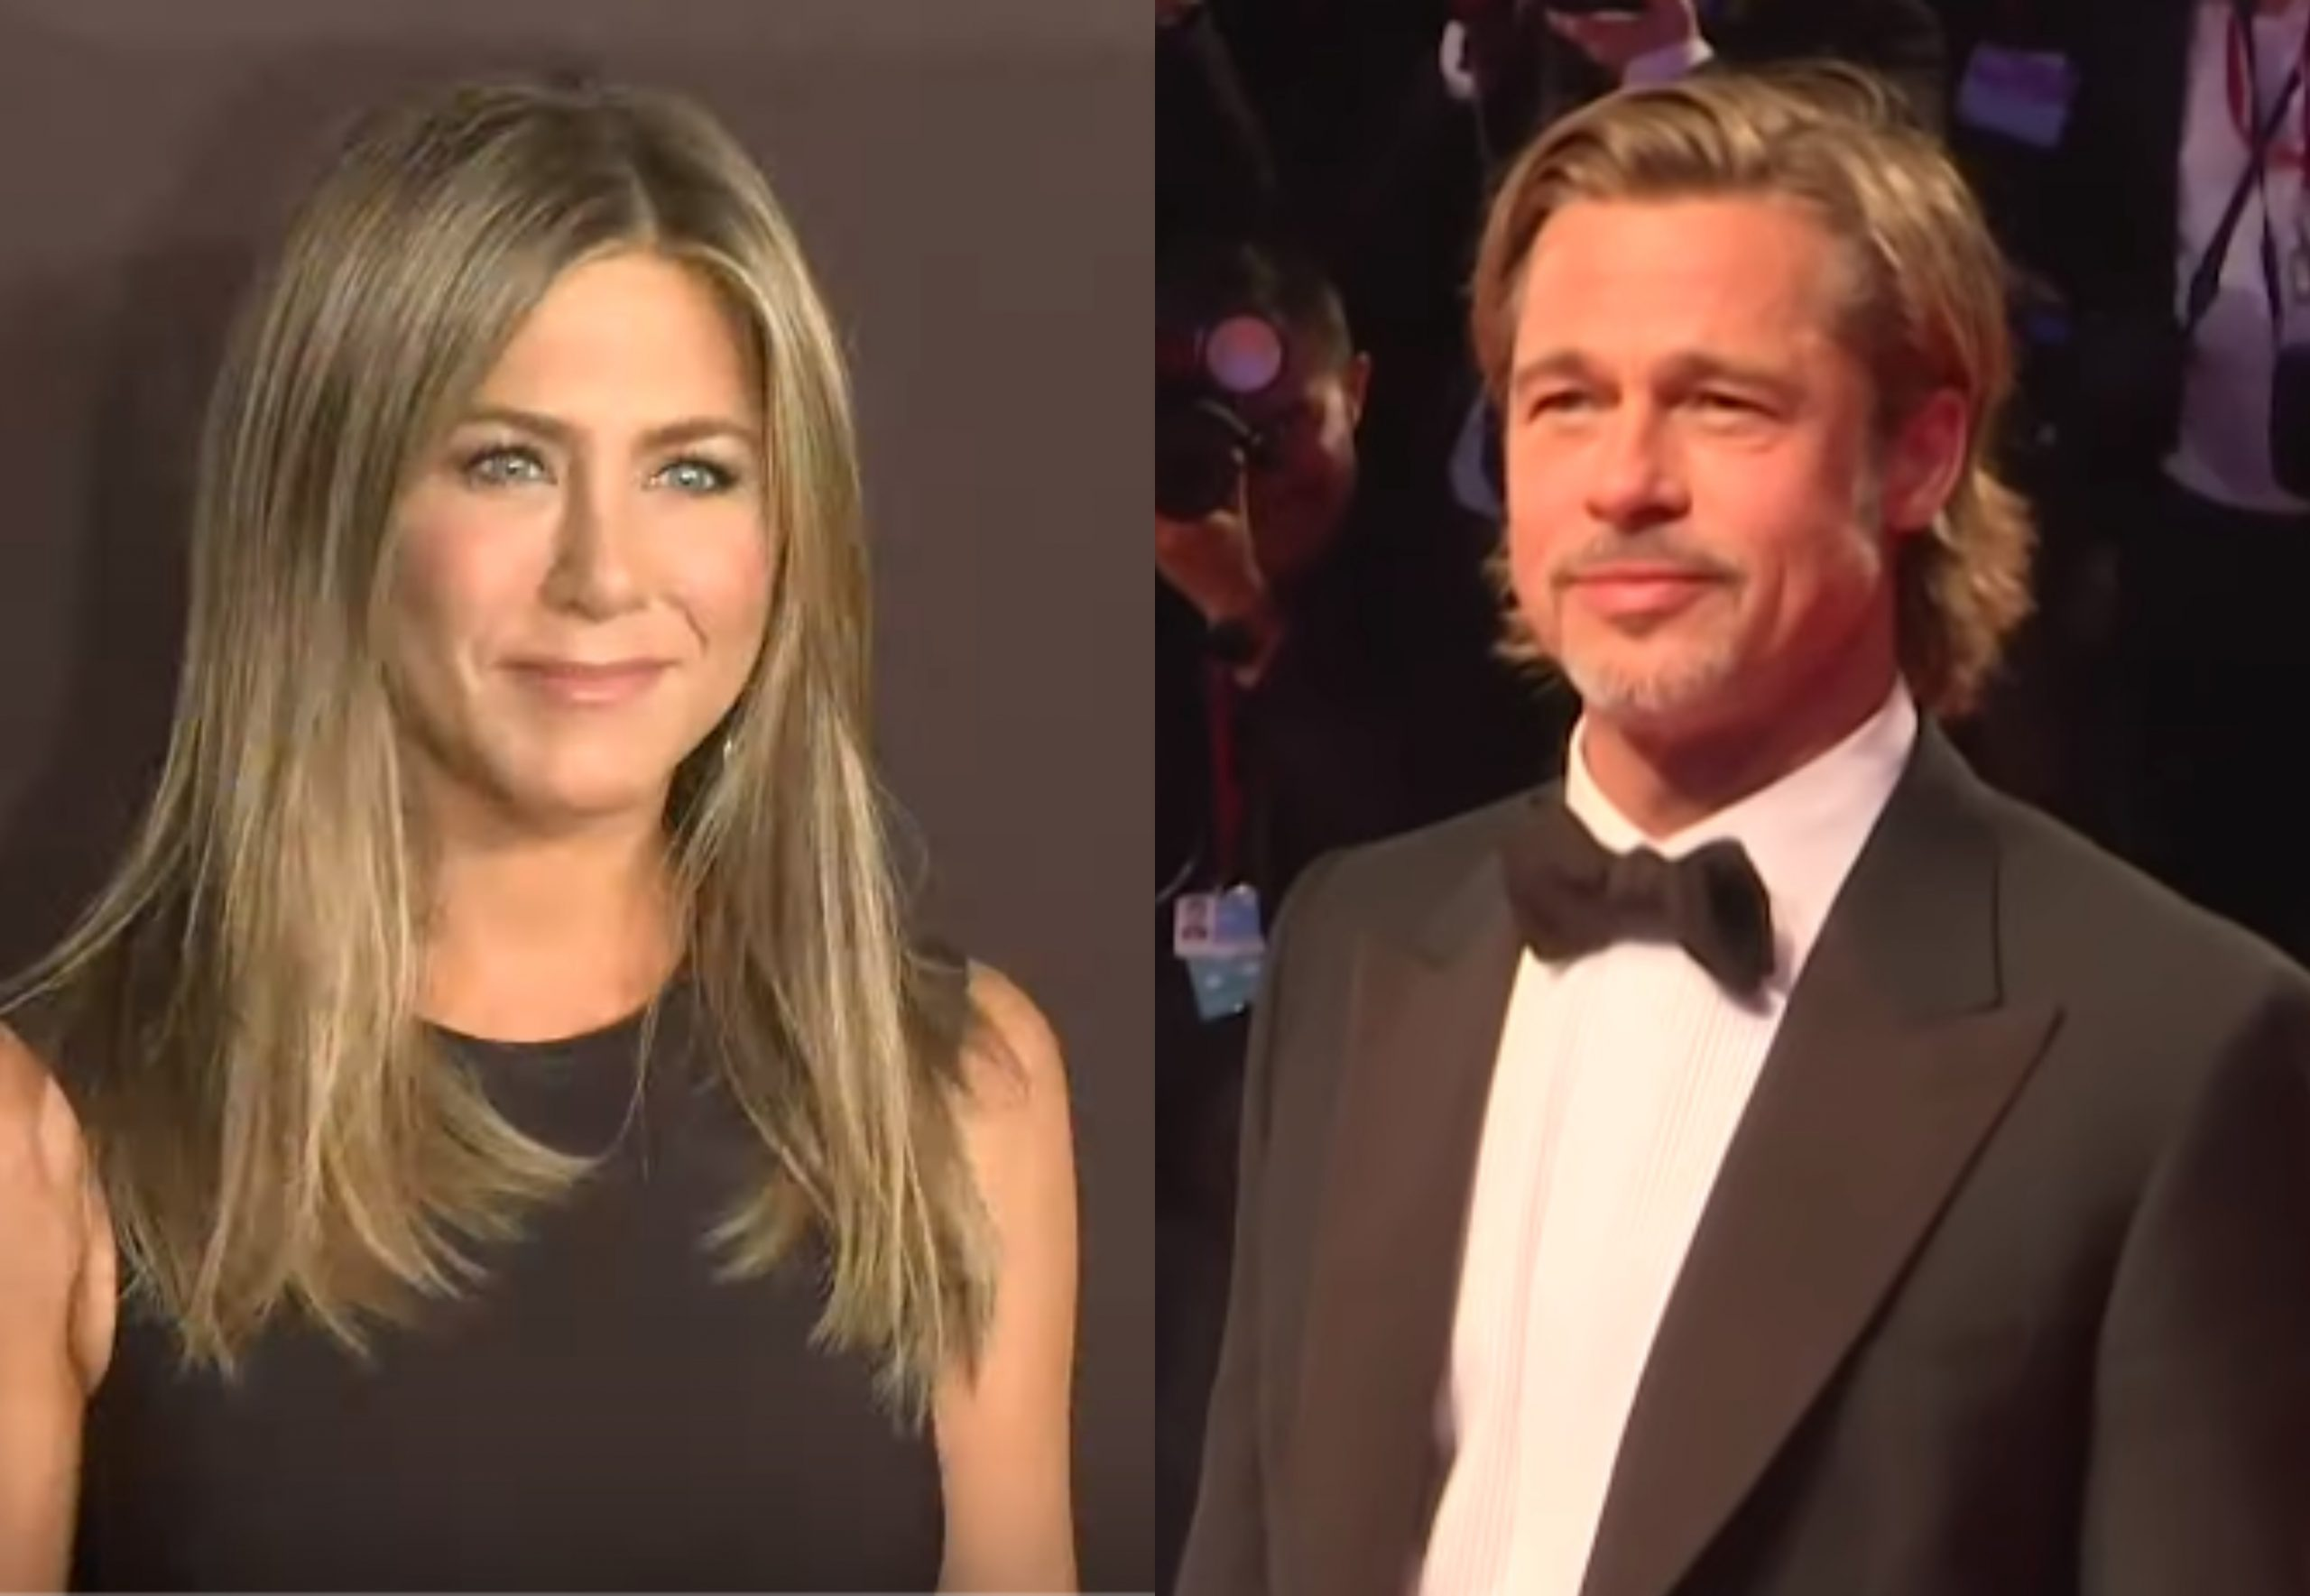 Brad Pitt visits Jennifer Aniston at her holiday party